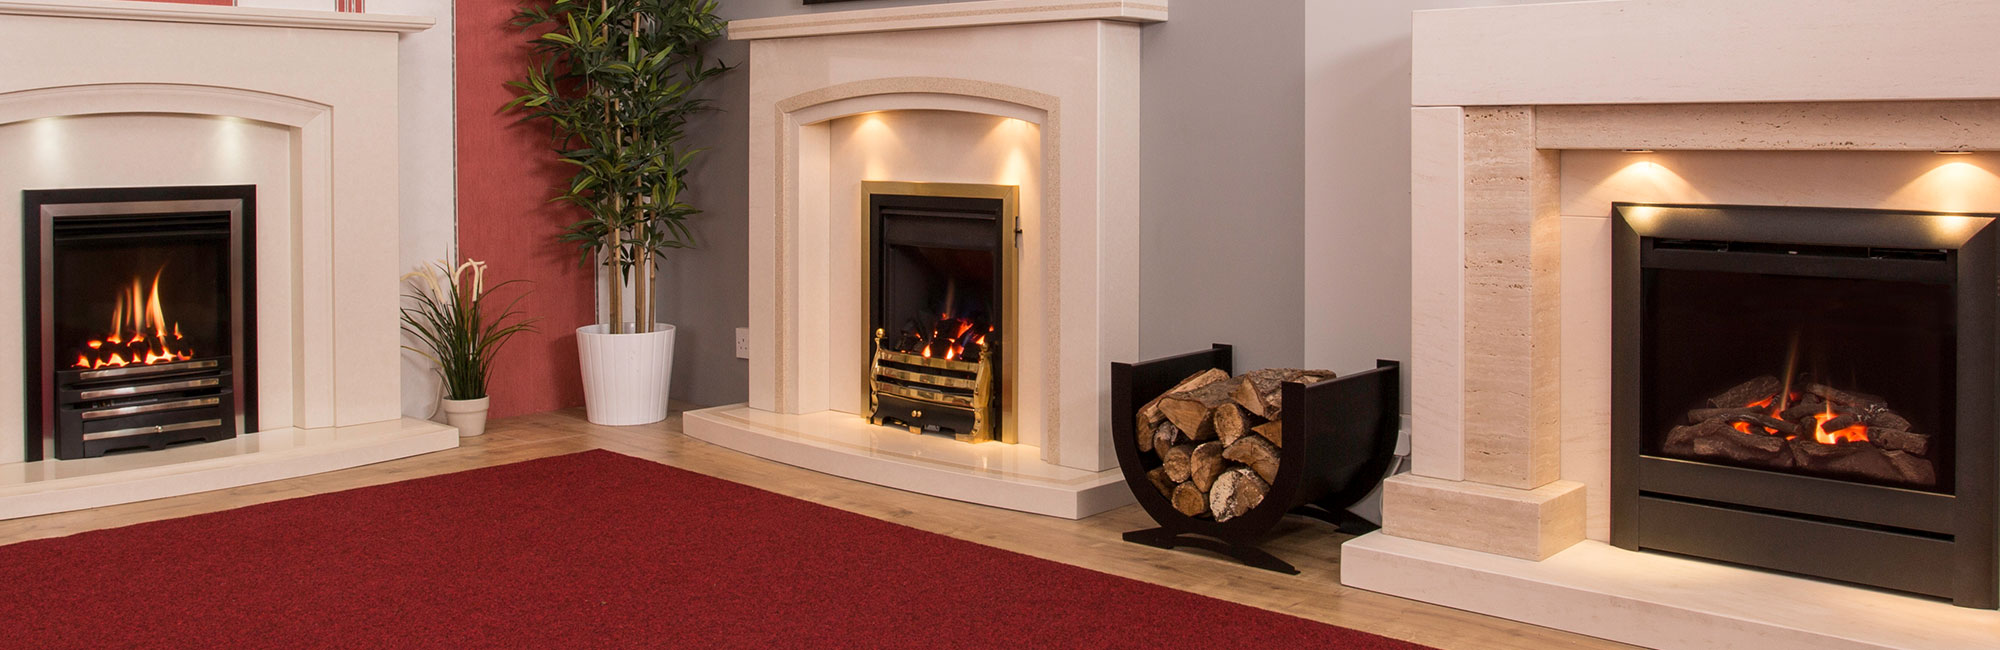 high efficiency gas fires nottingham u0026 derby the fireplace studio